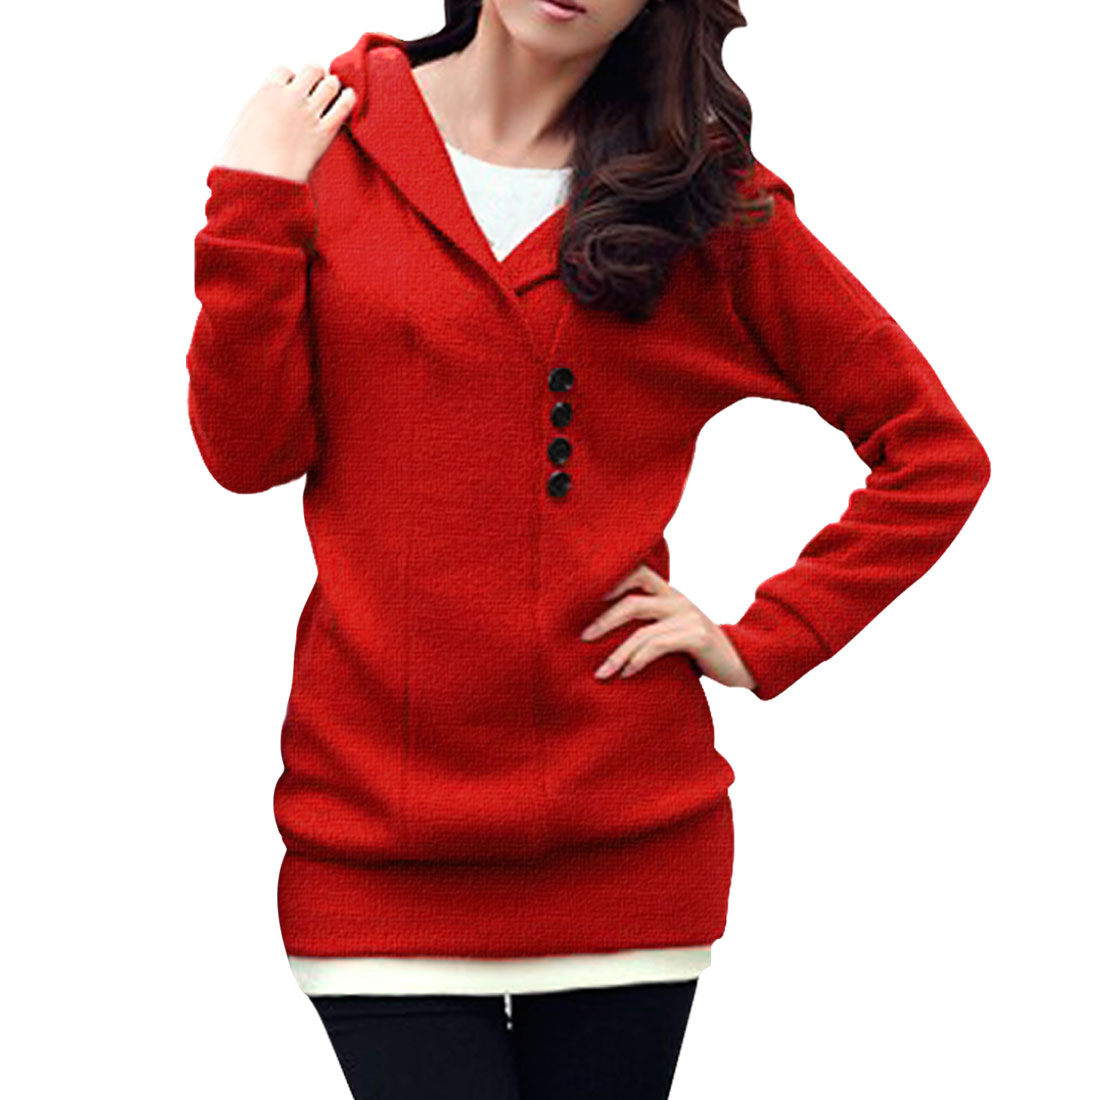 Allegra K Women's Dolman Design Pullover Button Decor Hooded Knit Shirt Red (Size XL / 16)